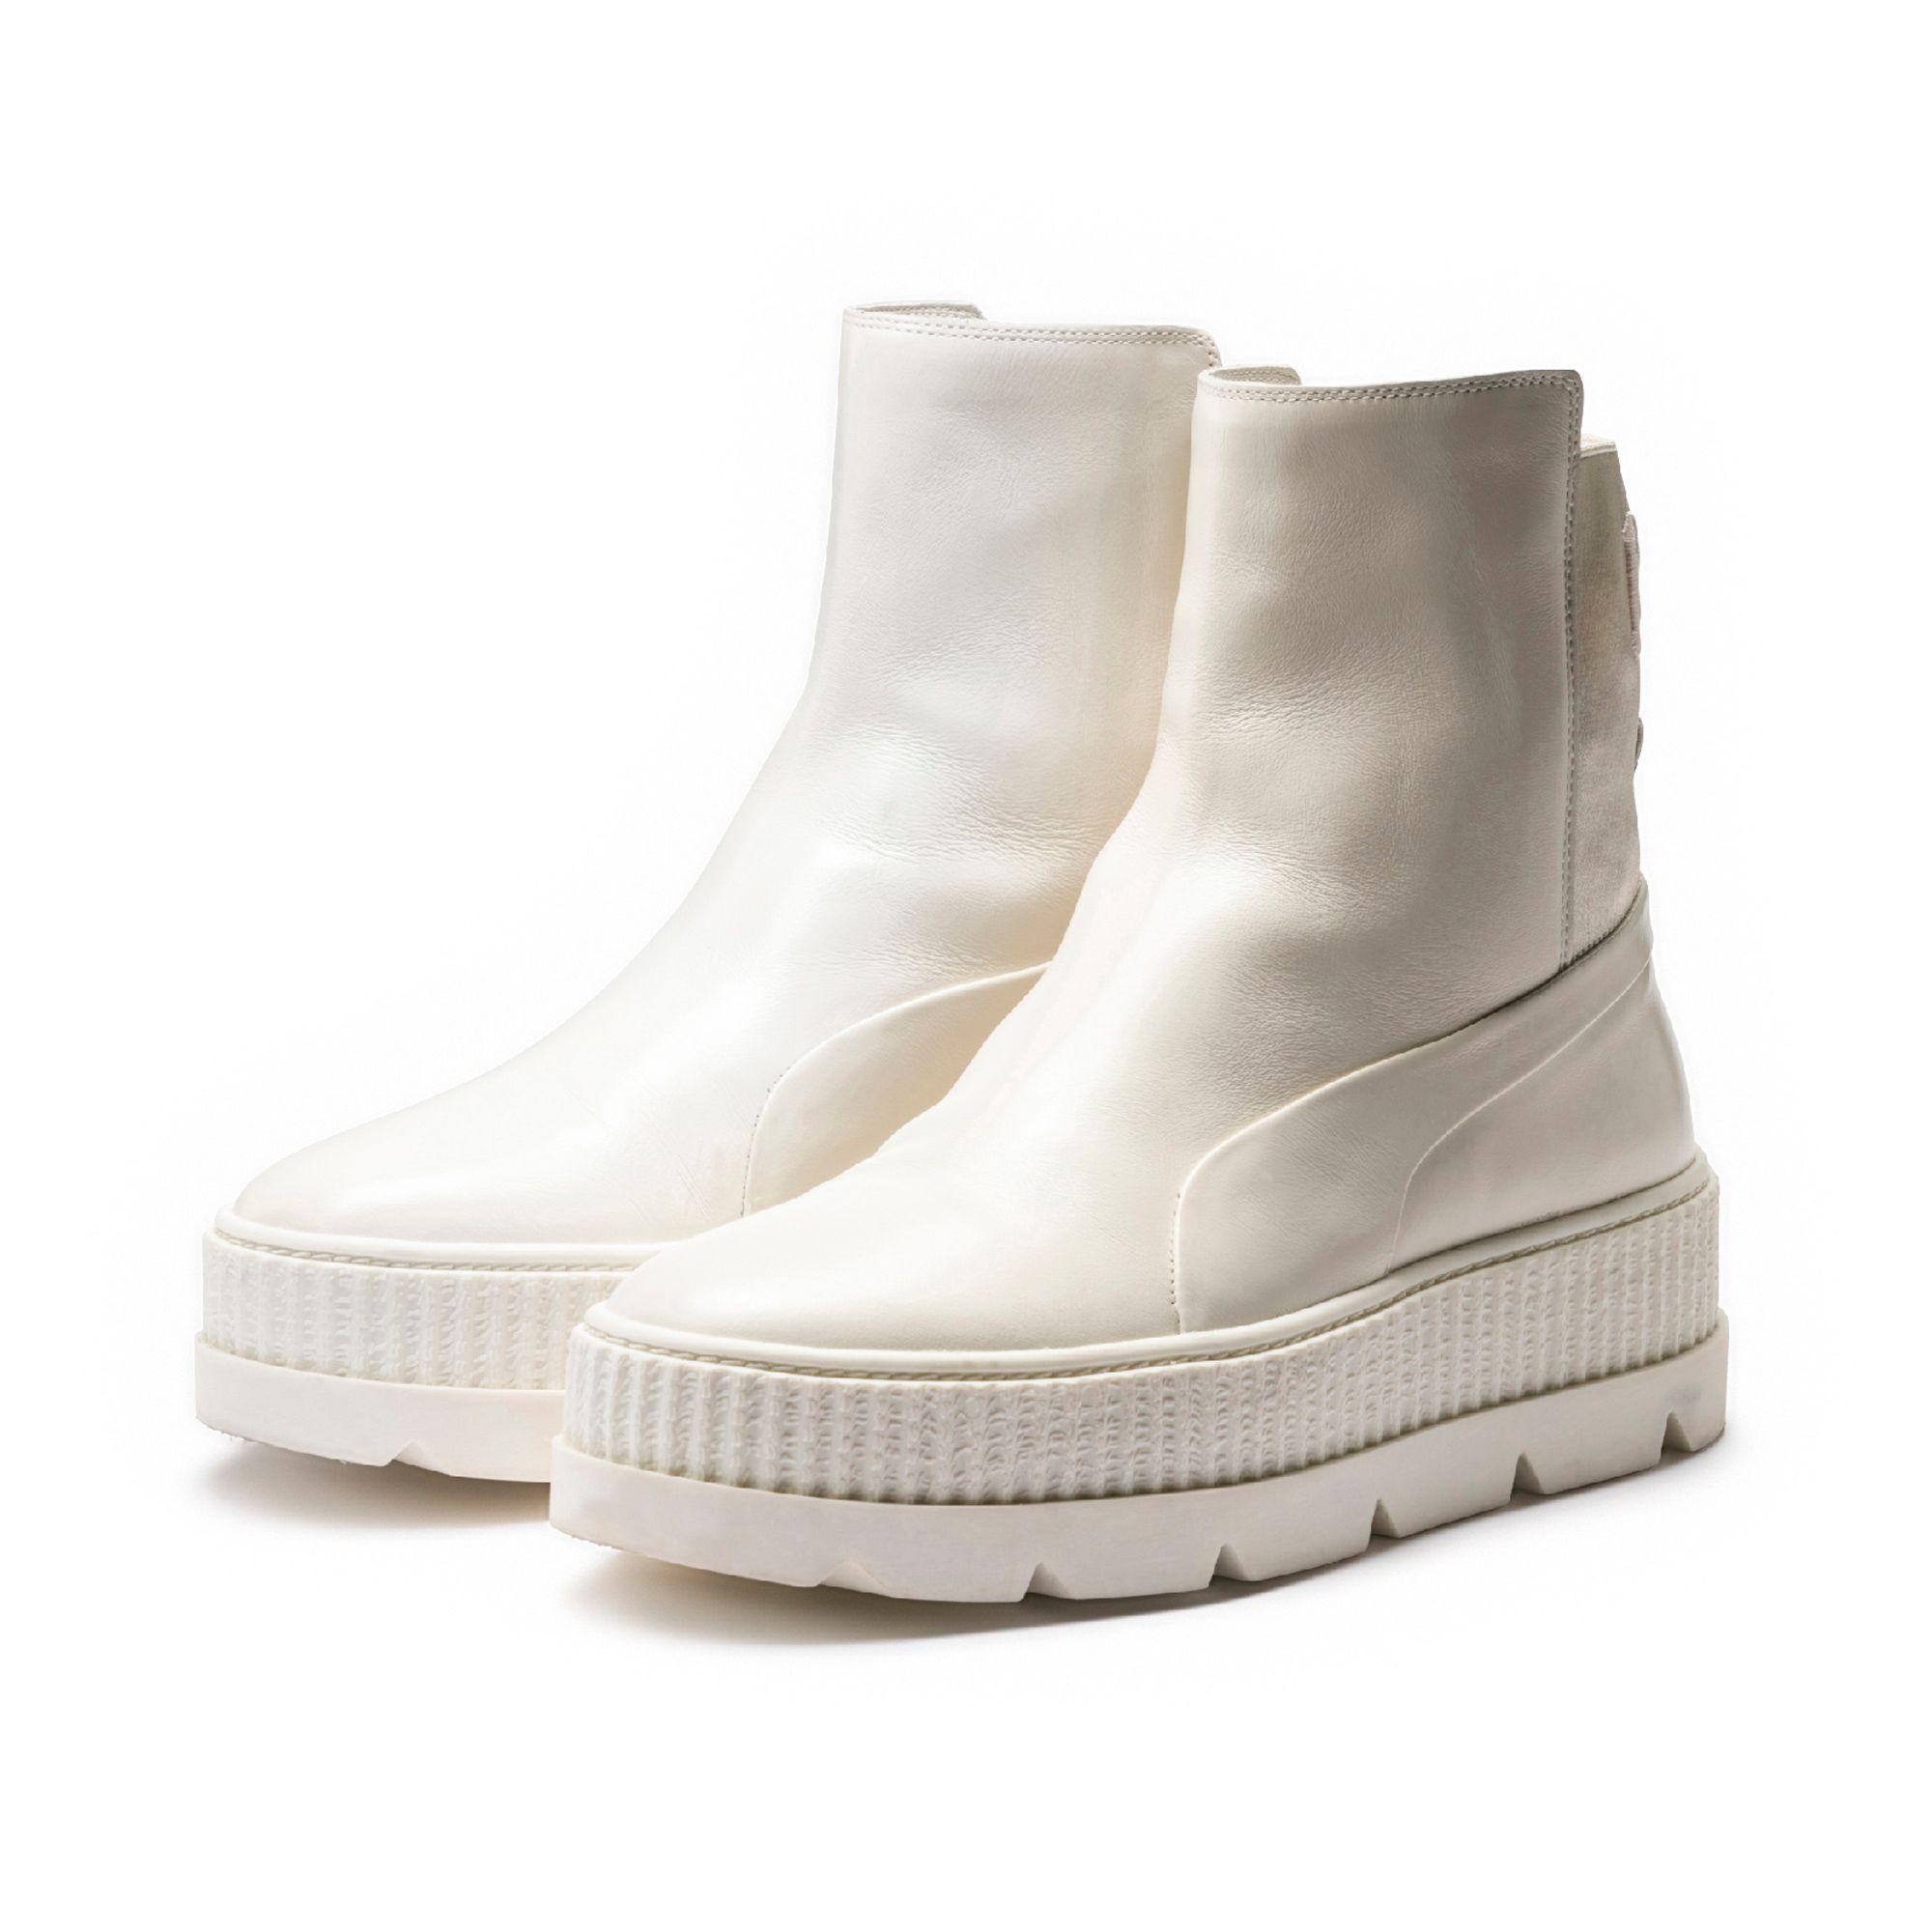 sale retailer b333a fff05 PUMA Multicolor Fenty Men's Chelsea Sneaker Boot for men